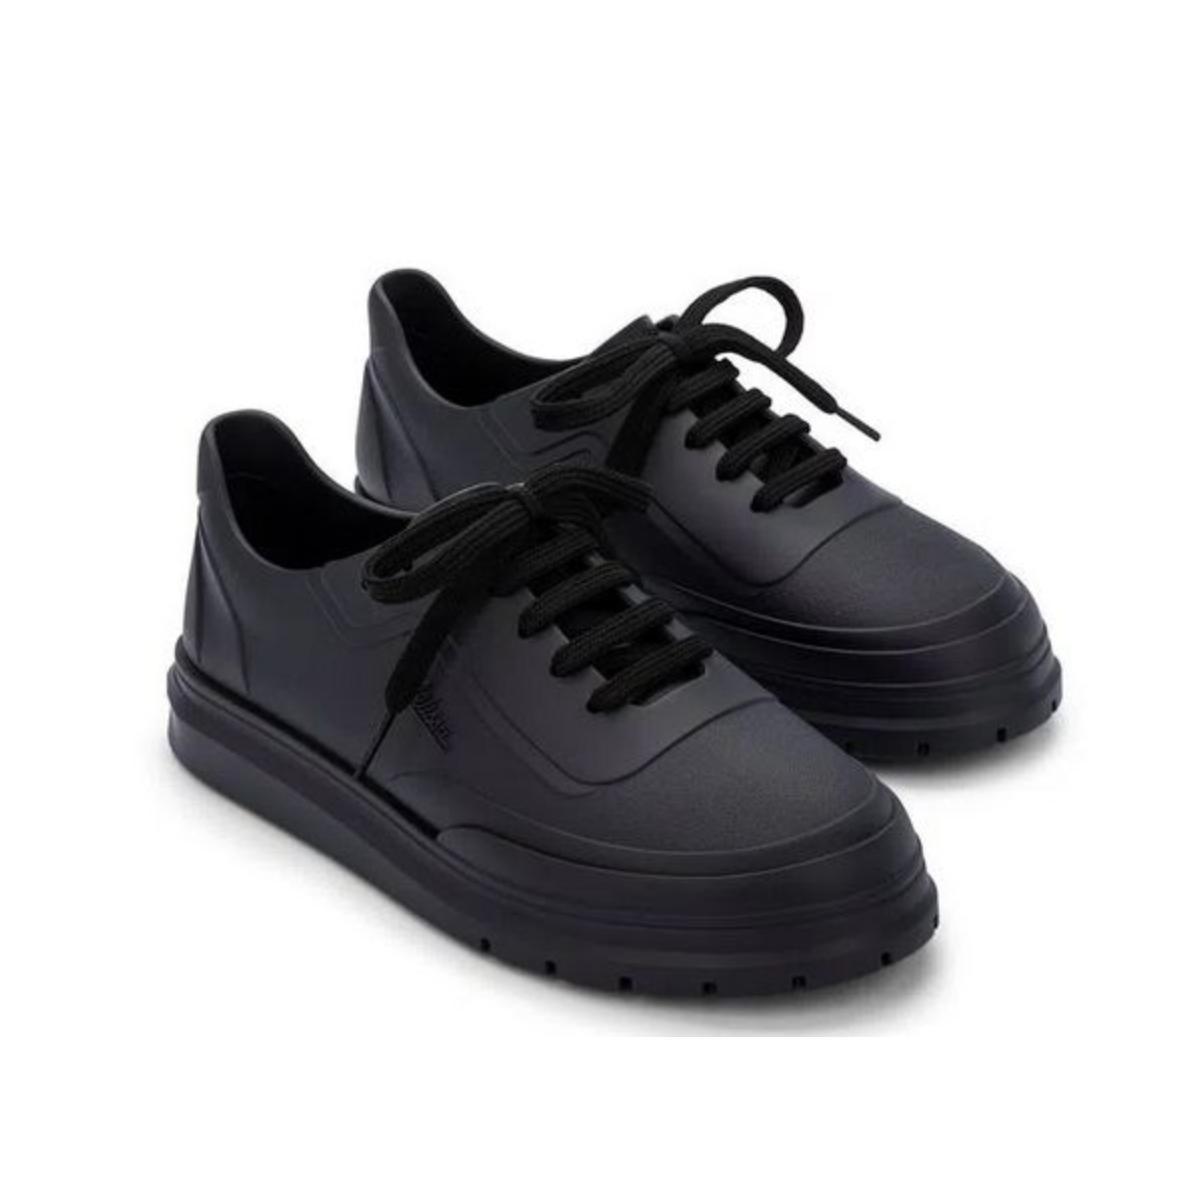 Tênis Feminino Melissa 33306 01003 Classic Sneaker Preto